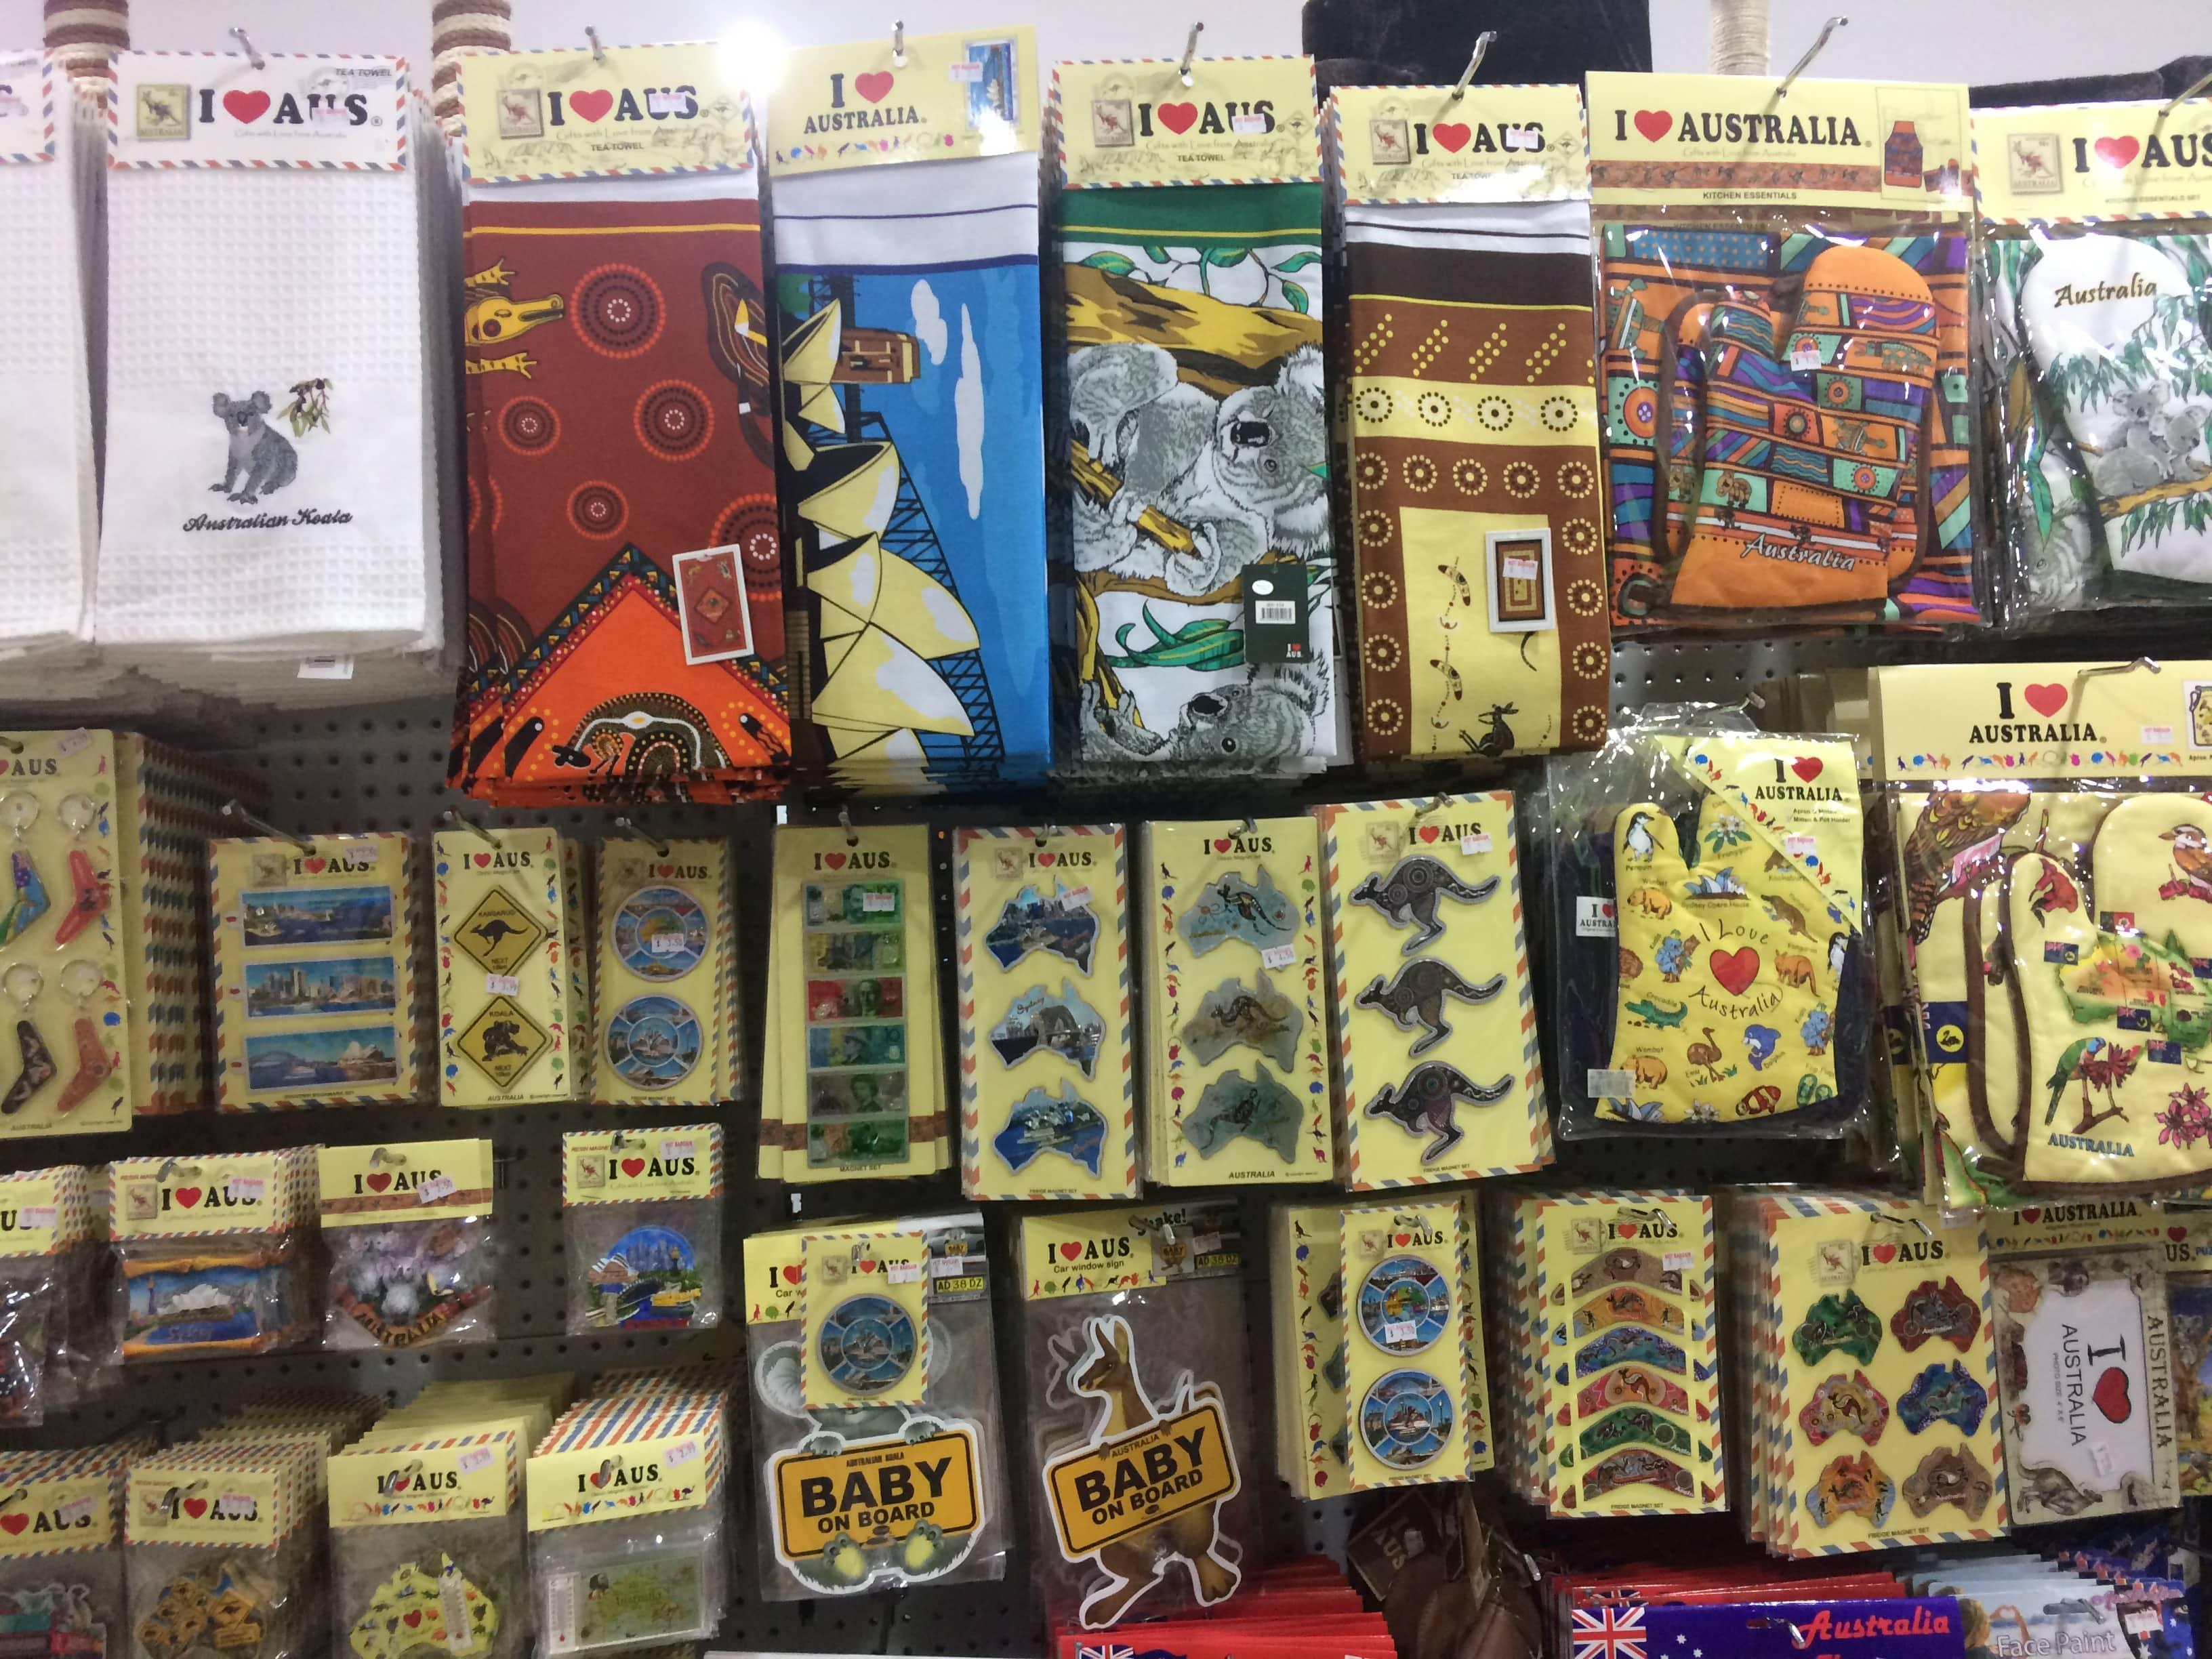 A wall of Australian souvenirs